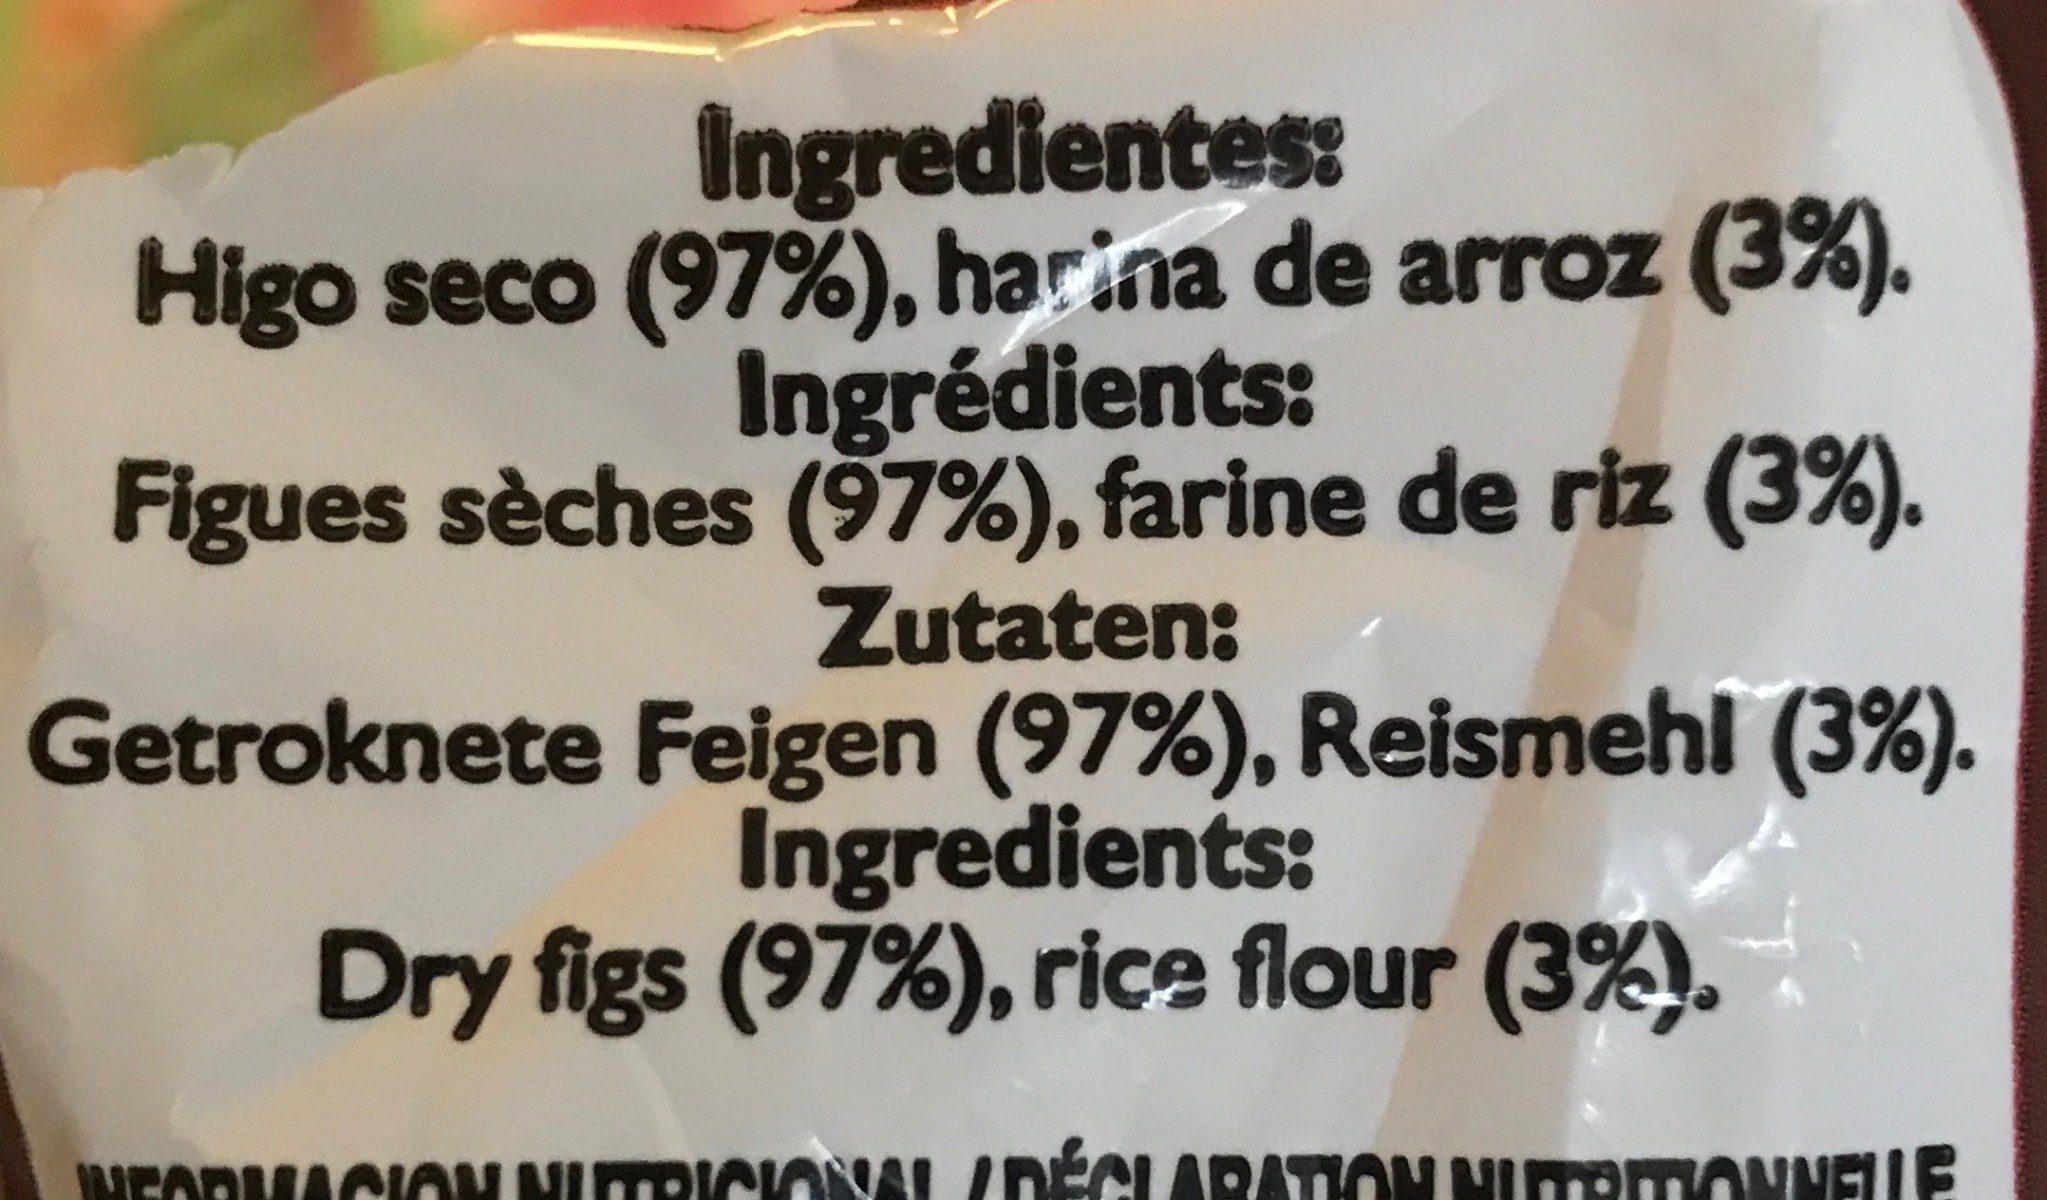 Higos secos - Ingrédients - fr